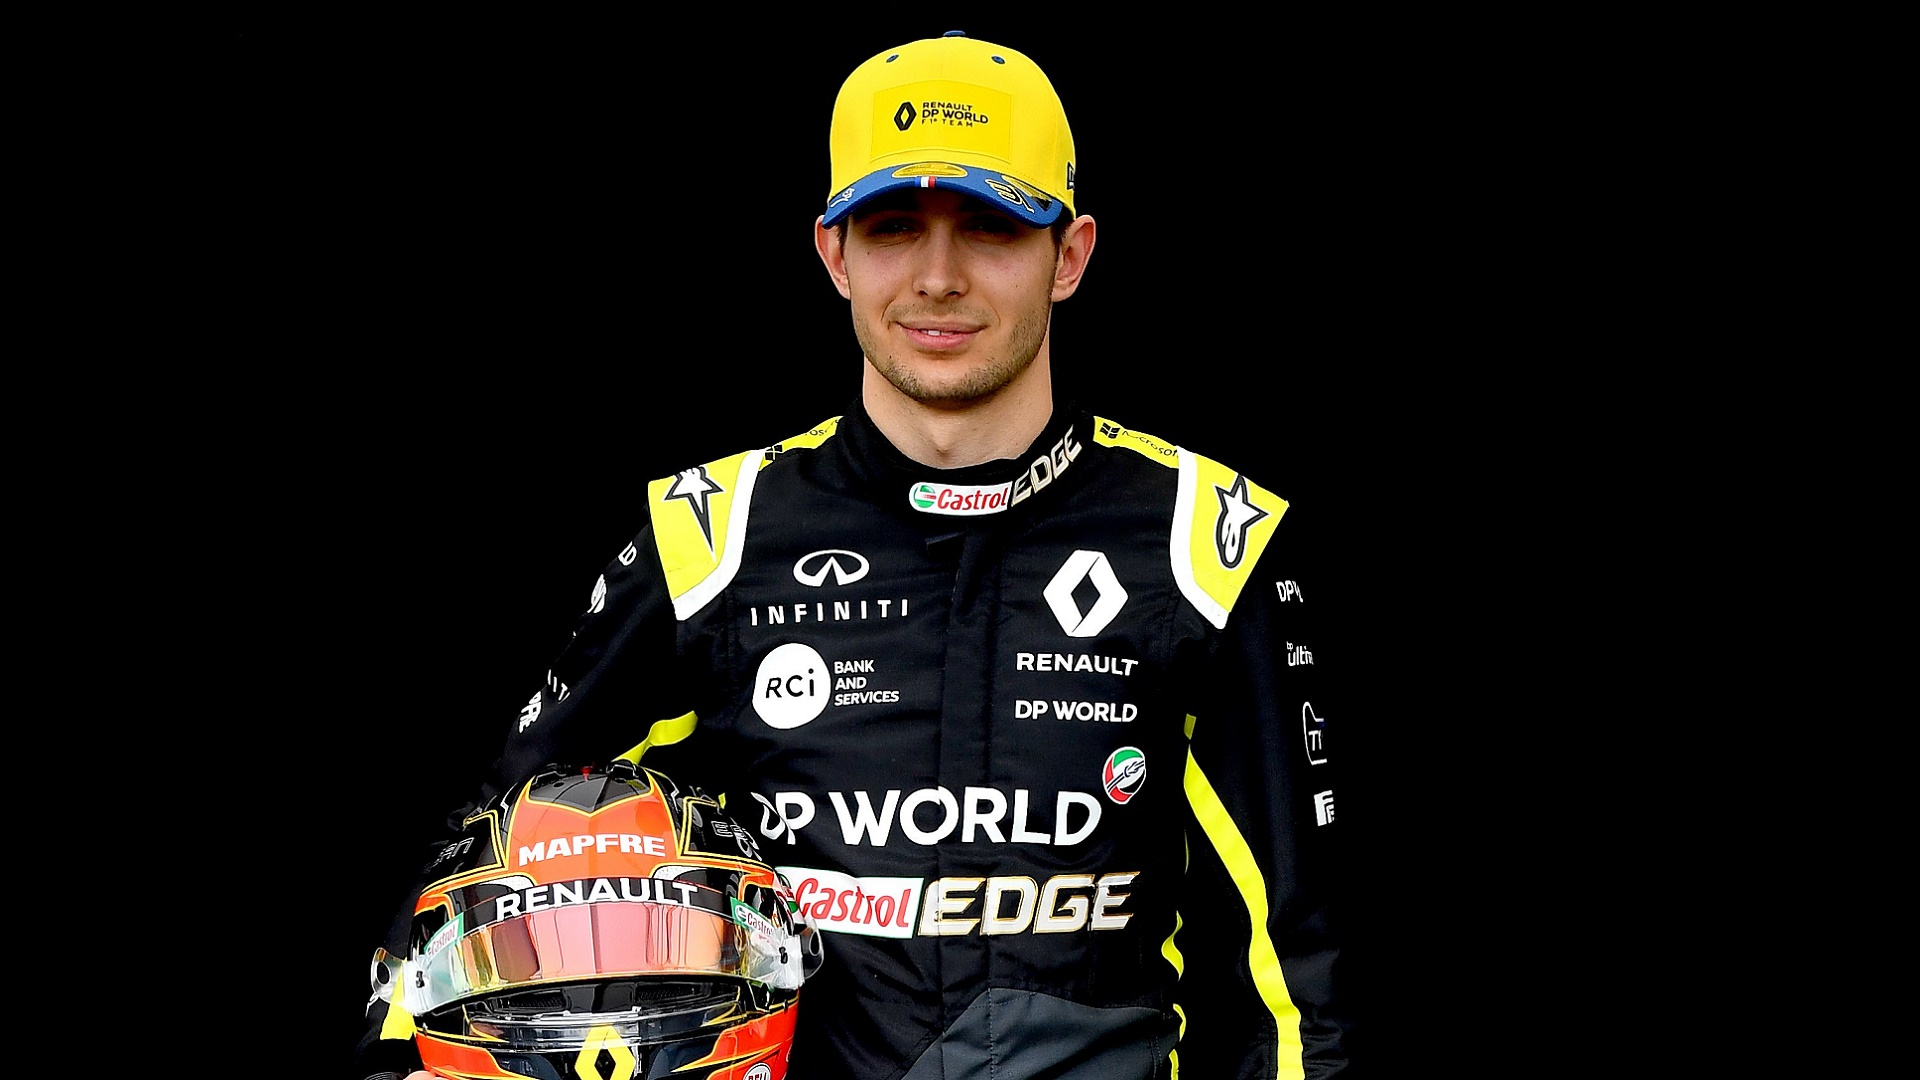 2020-07-08 Formula 1 F1 Ocon Renault